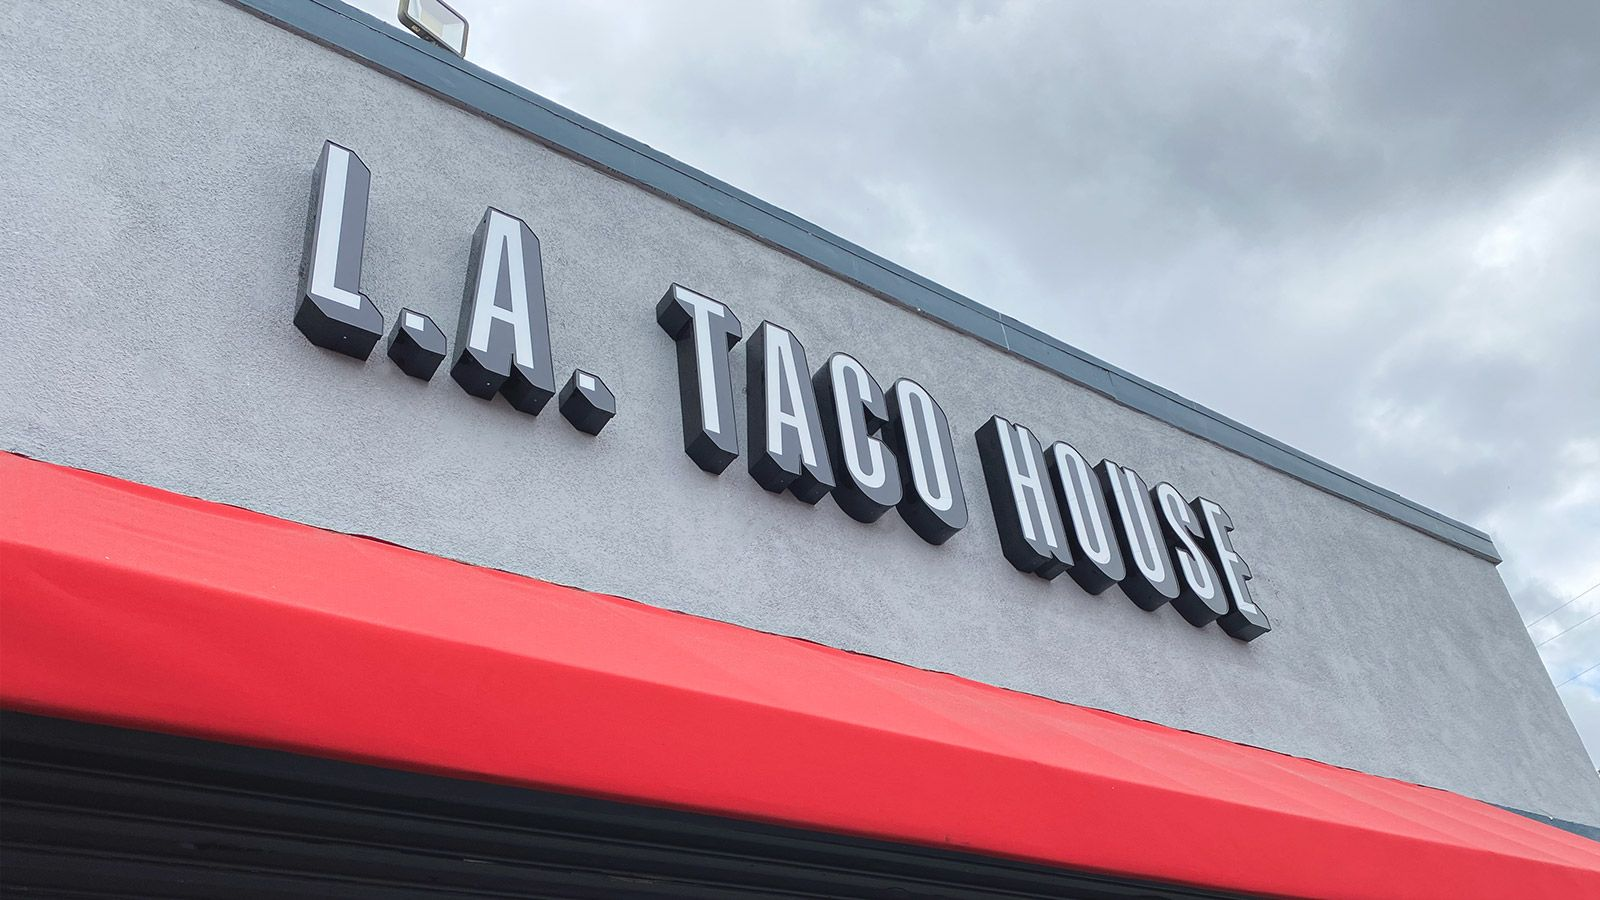 LA taco house LED sign